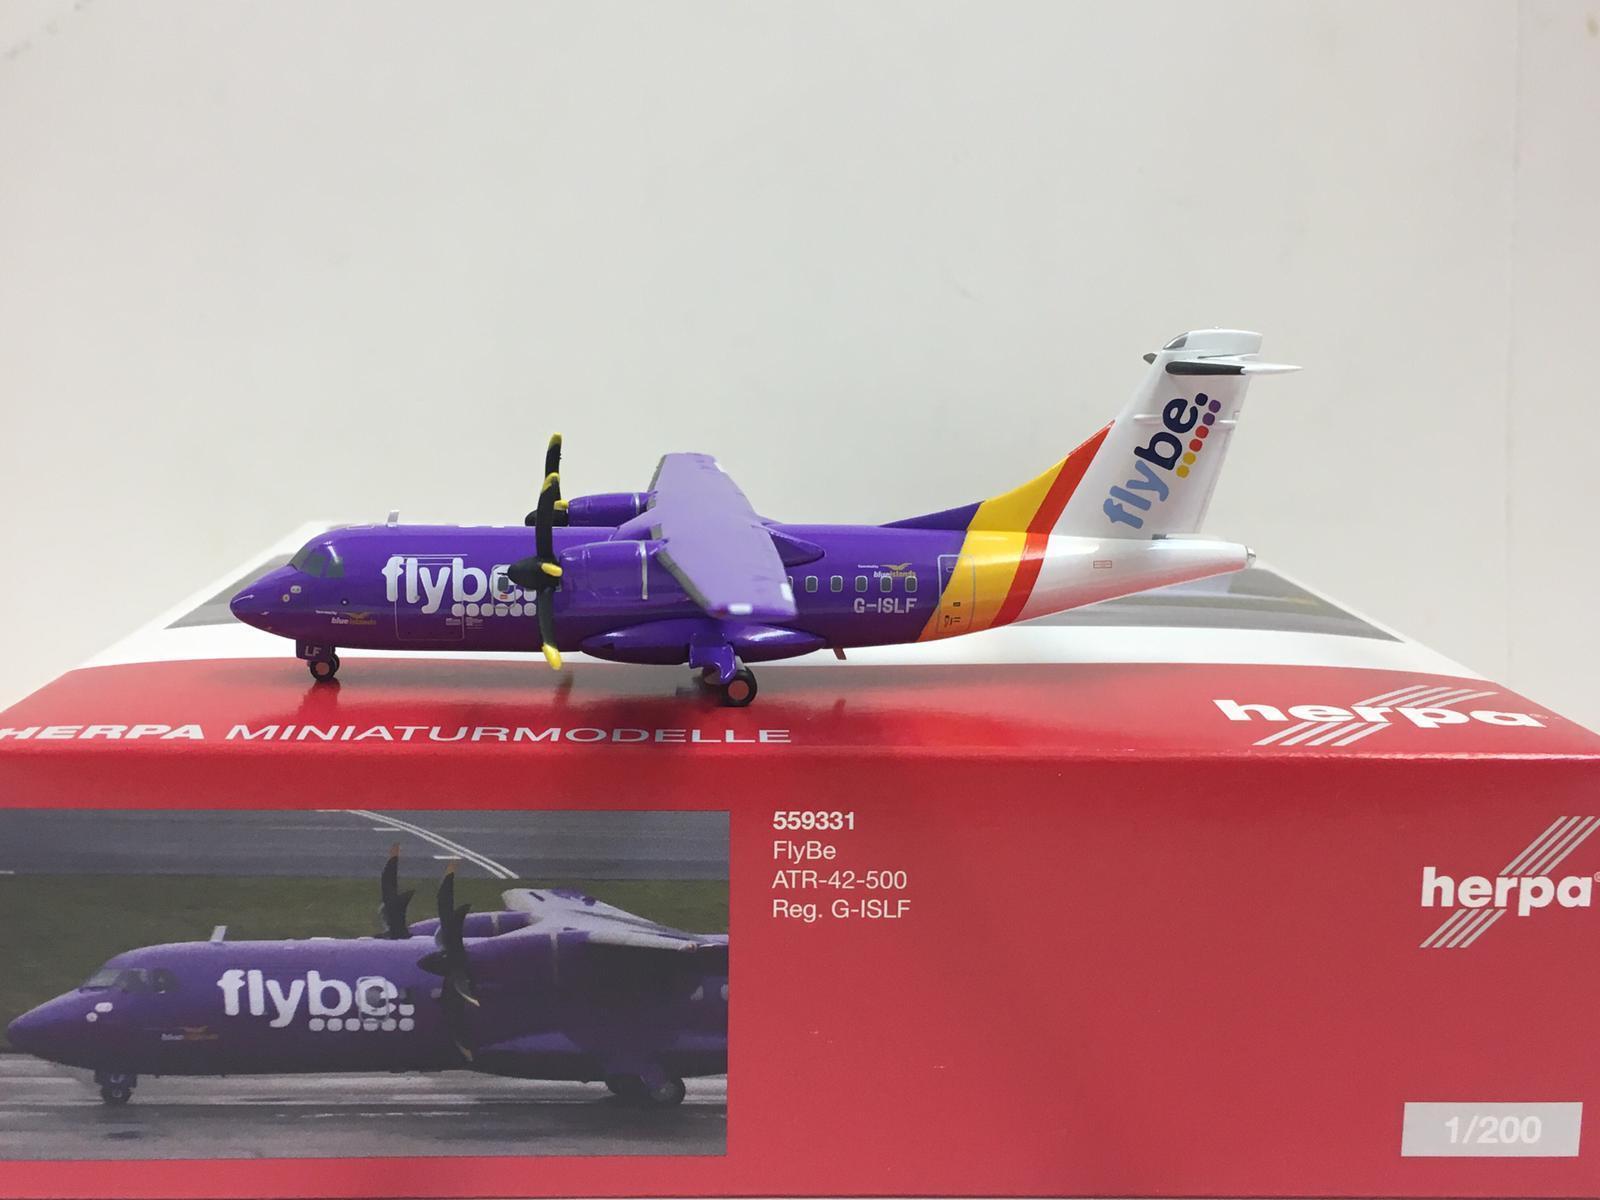 Herpa Wings Flybe ATR-42-500 1 200 G-islf 559331